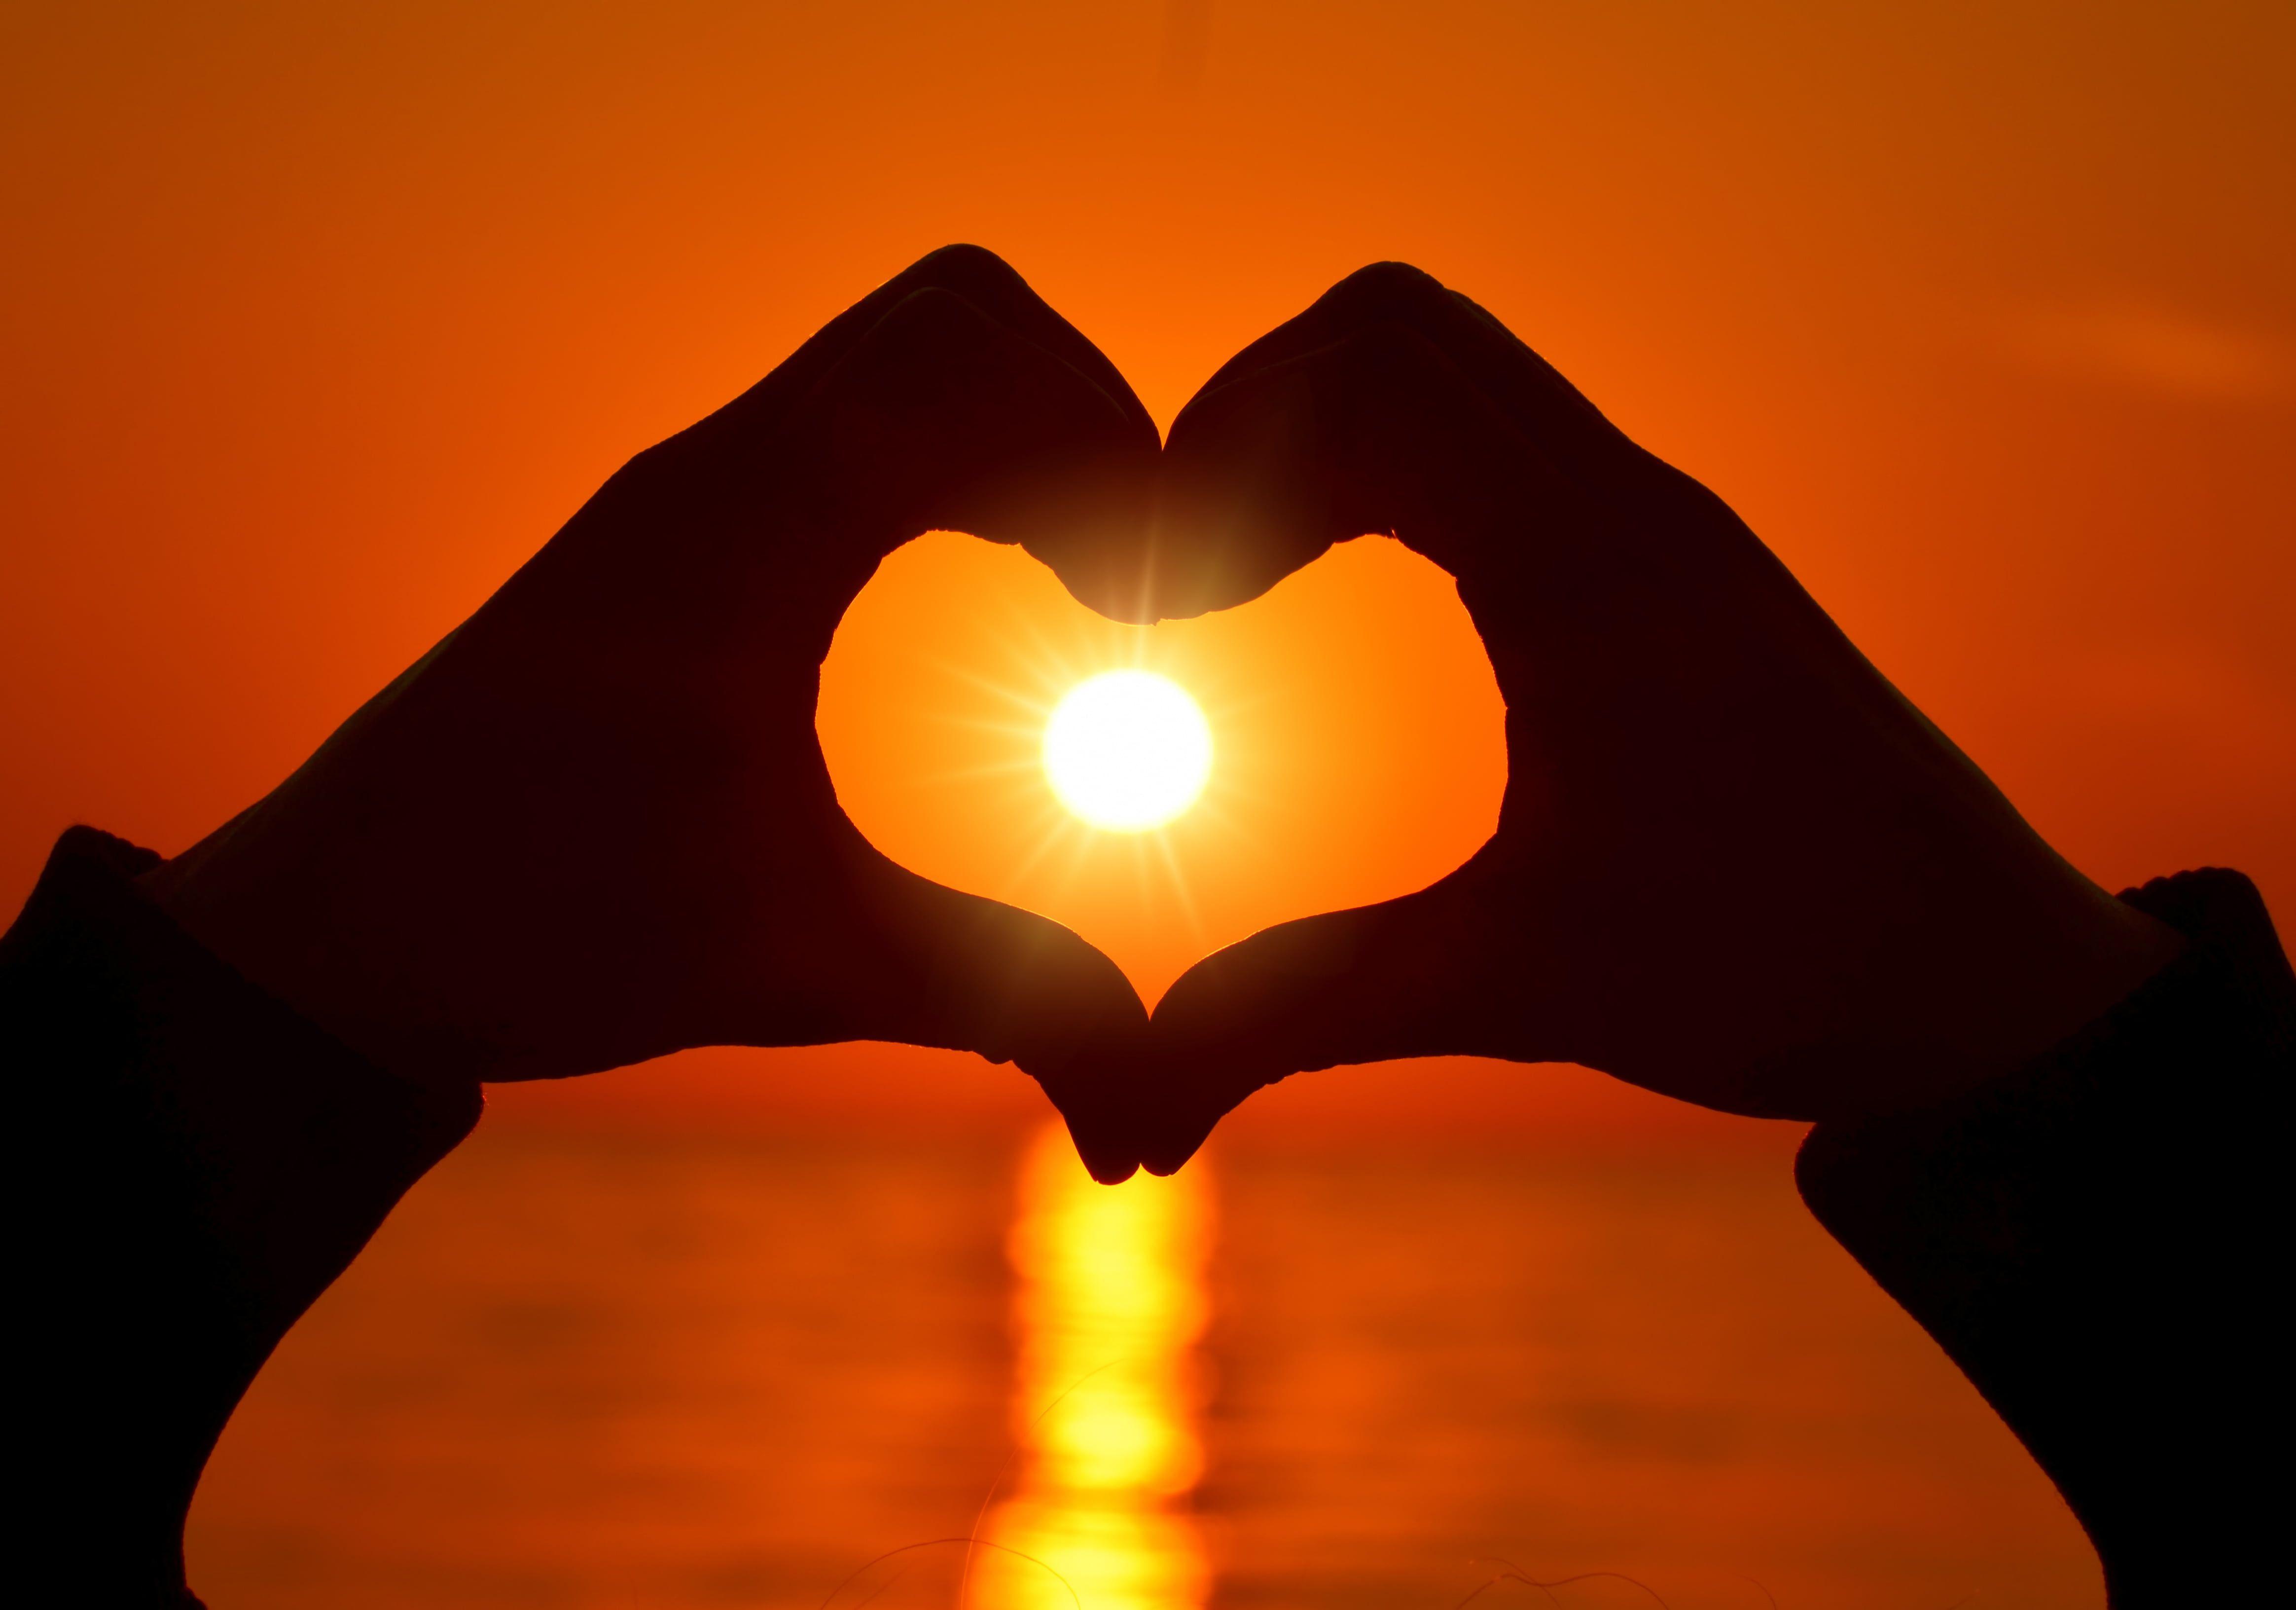 Hand Heart Form Love Heart Love Heart Sunset Romantic Hands 4k Wallpaper Hdwallpaper Desktop Love Wallpaper Wallpaper Love Heart Symbol Hand shaped love wallpaper in sunset